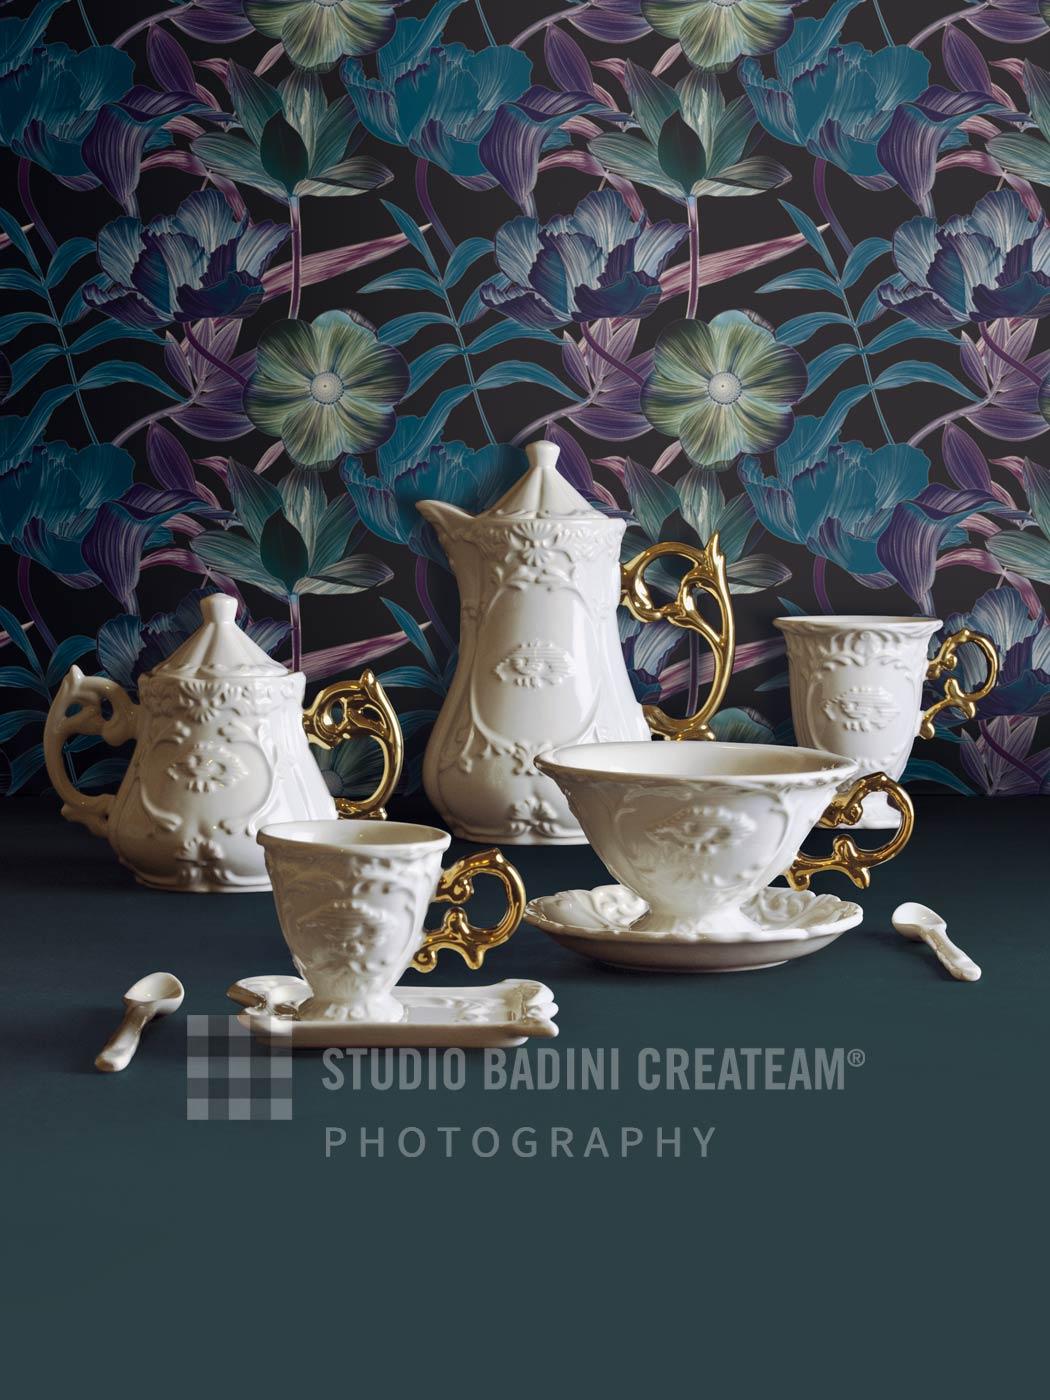 Badini Creative Studio - fotografia - seletti - iwares